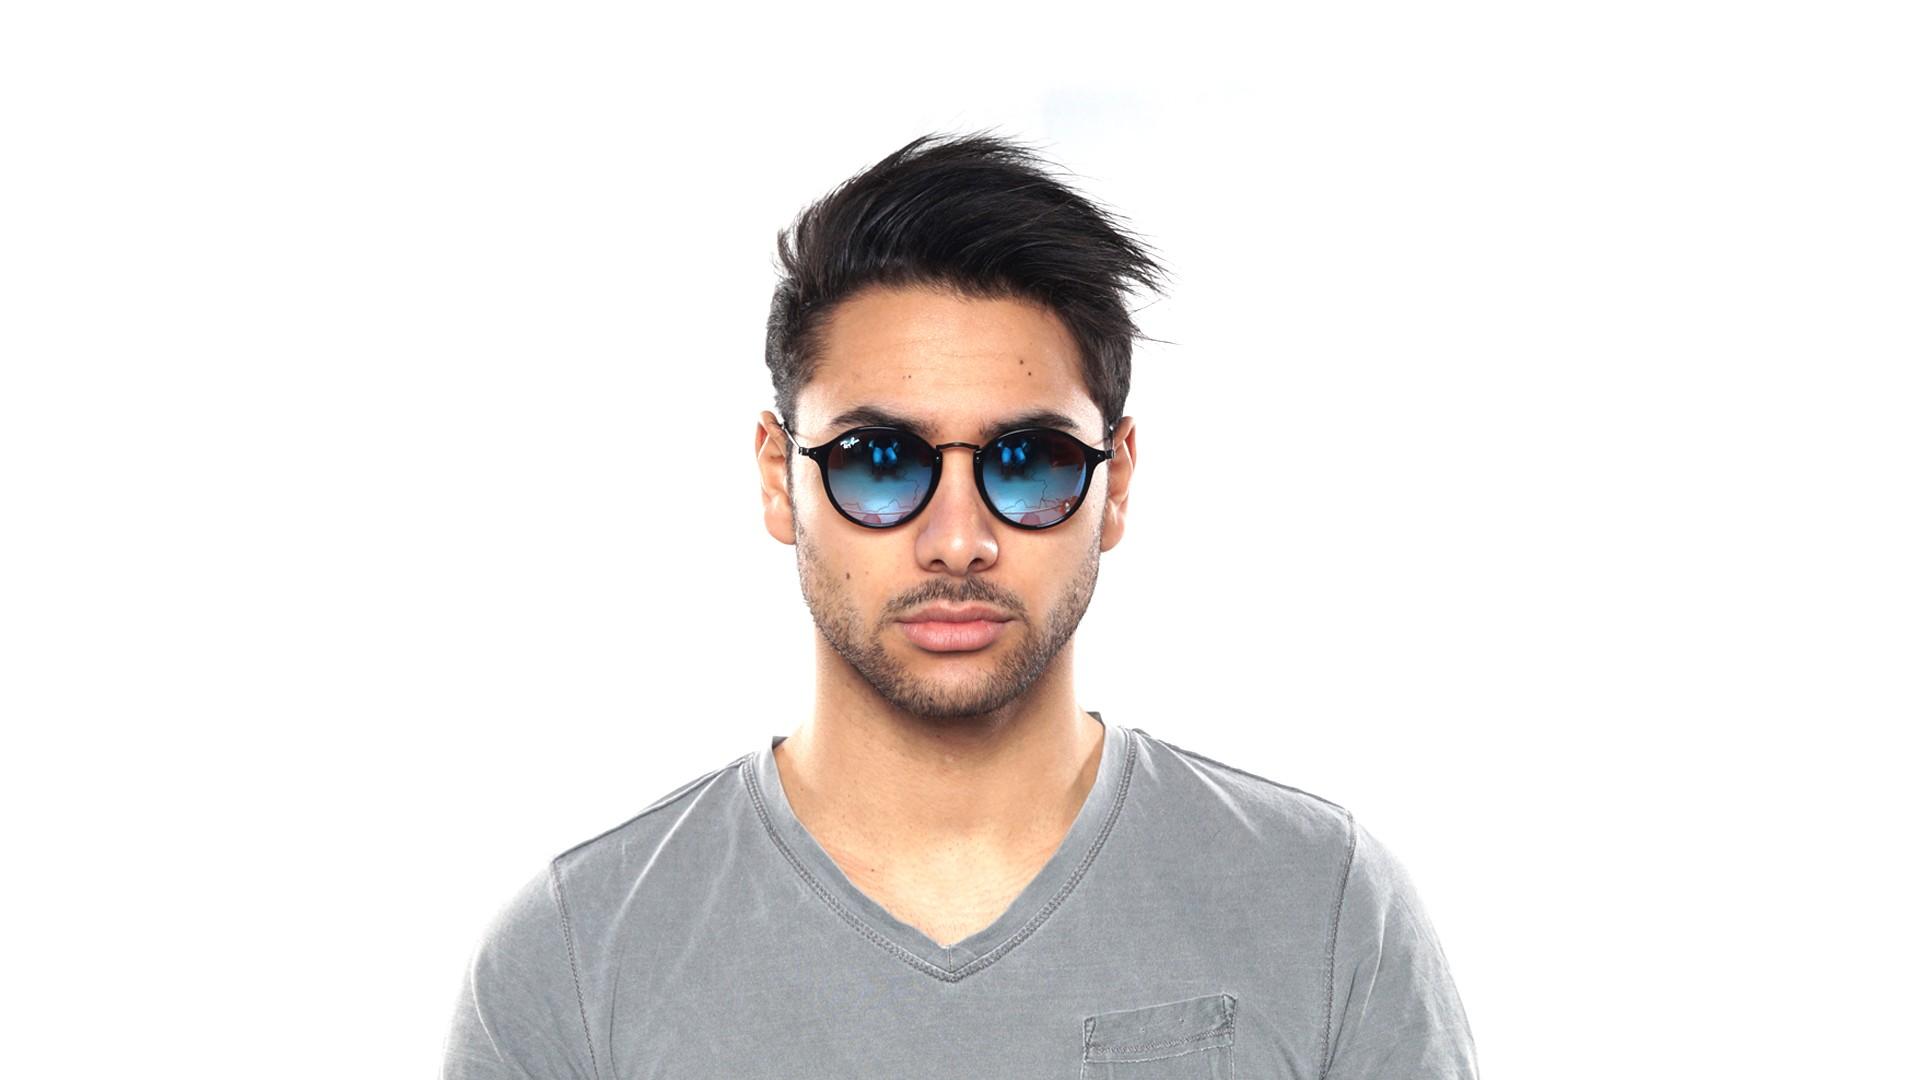 13adf8e8b9c Sunglasses Ray-Ban Round Fleck Black RB2447 901 4O 49-21 Medium Gradient  Mirror